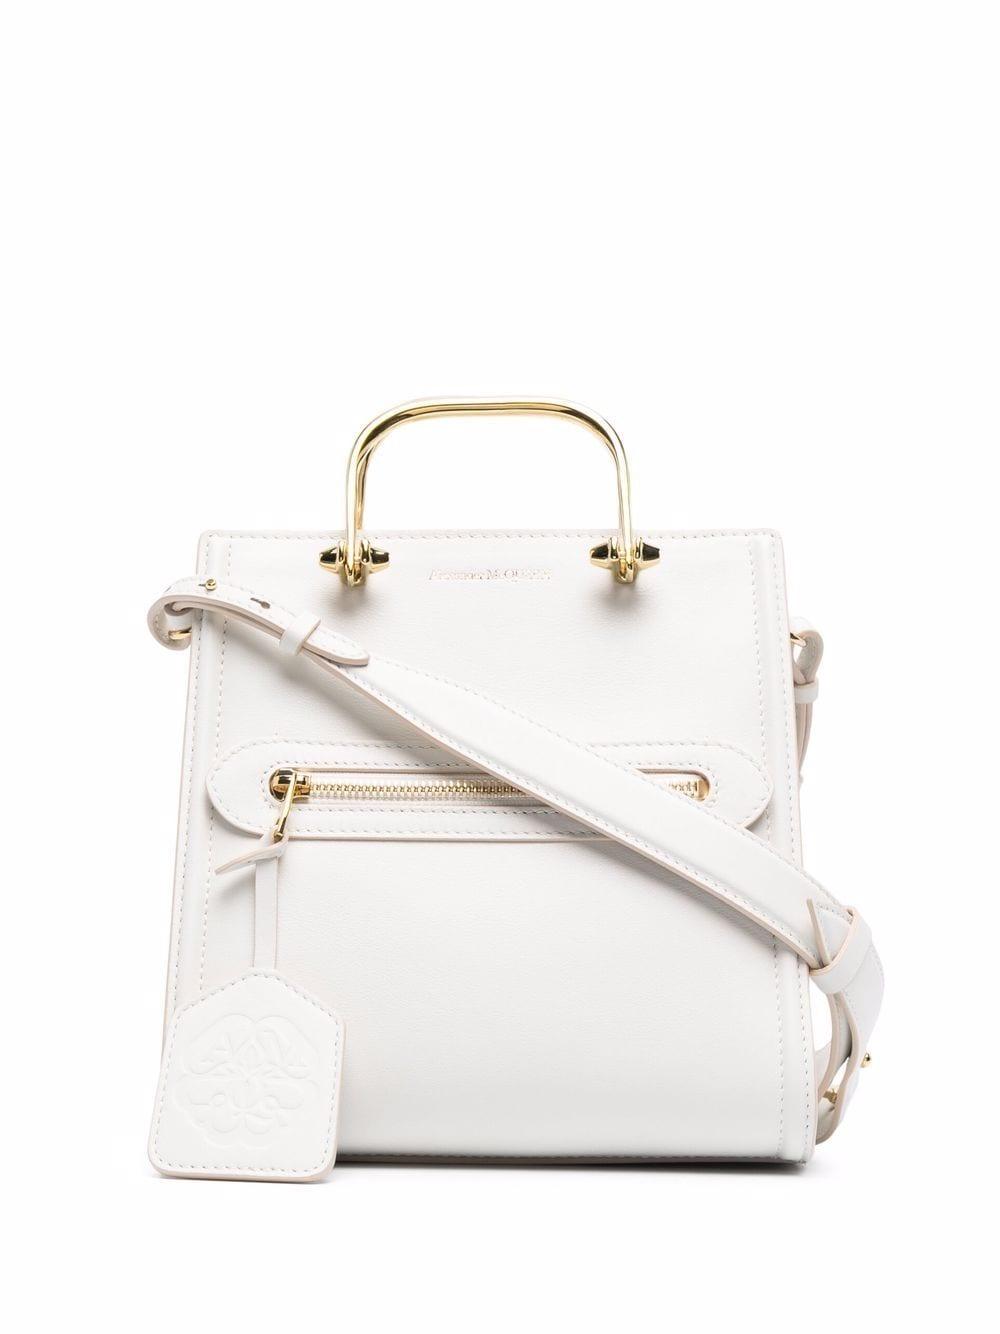 Alexander McQueen The Short Story Handtasche - Weiß